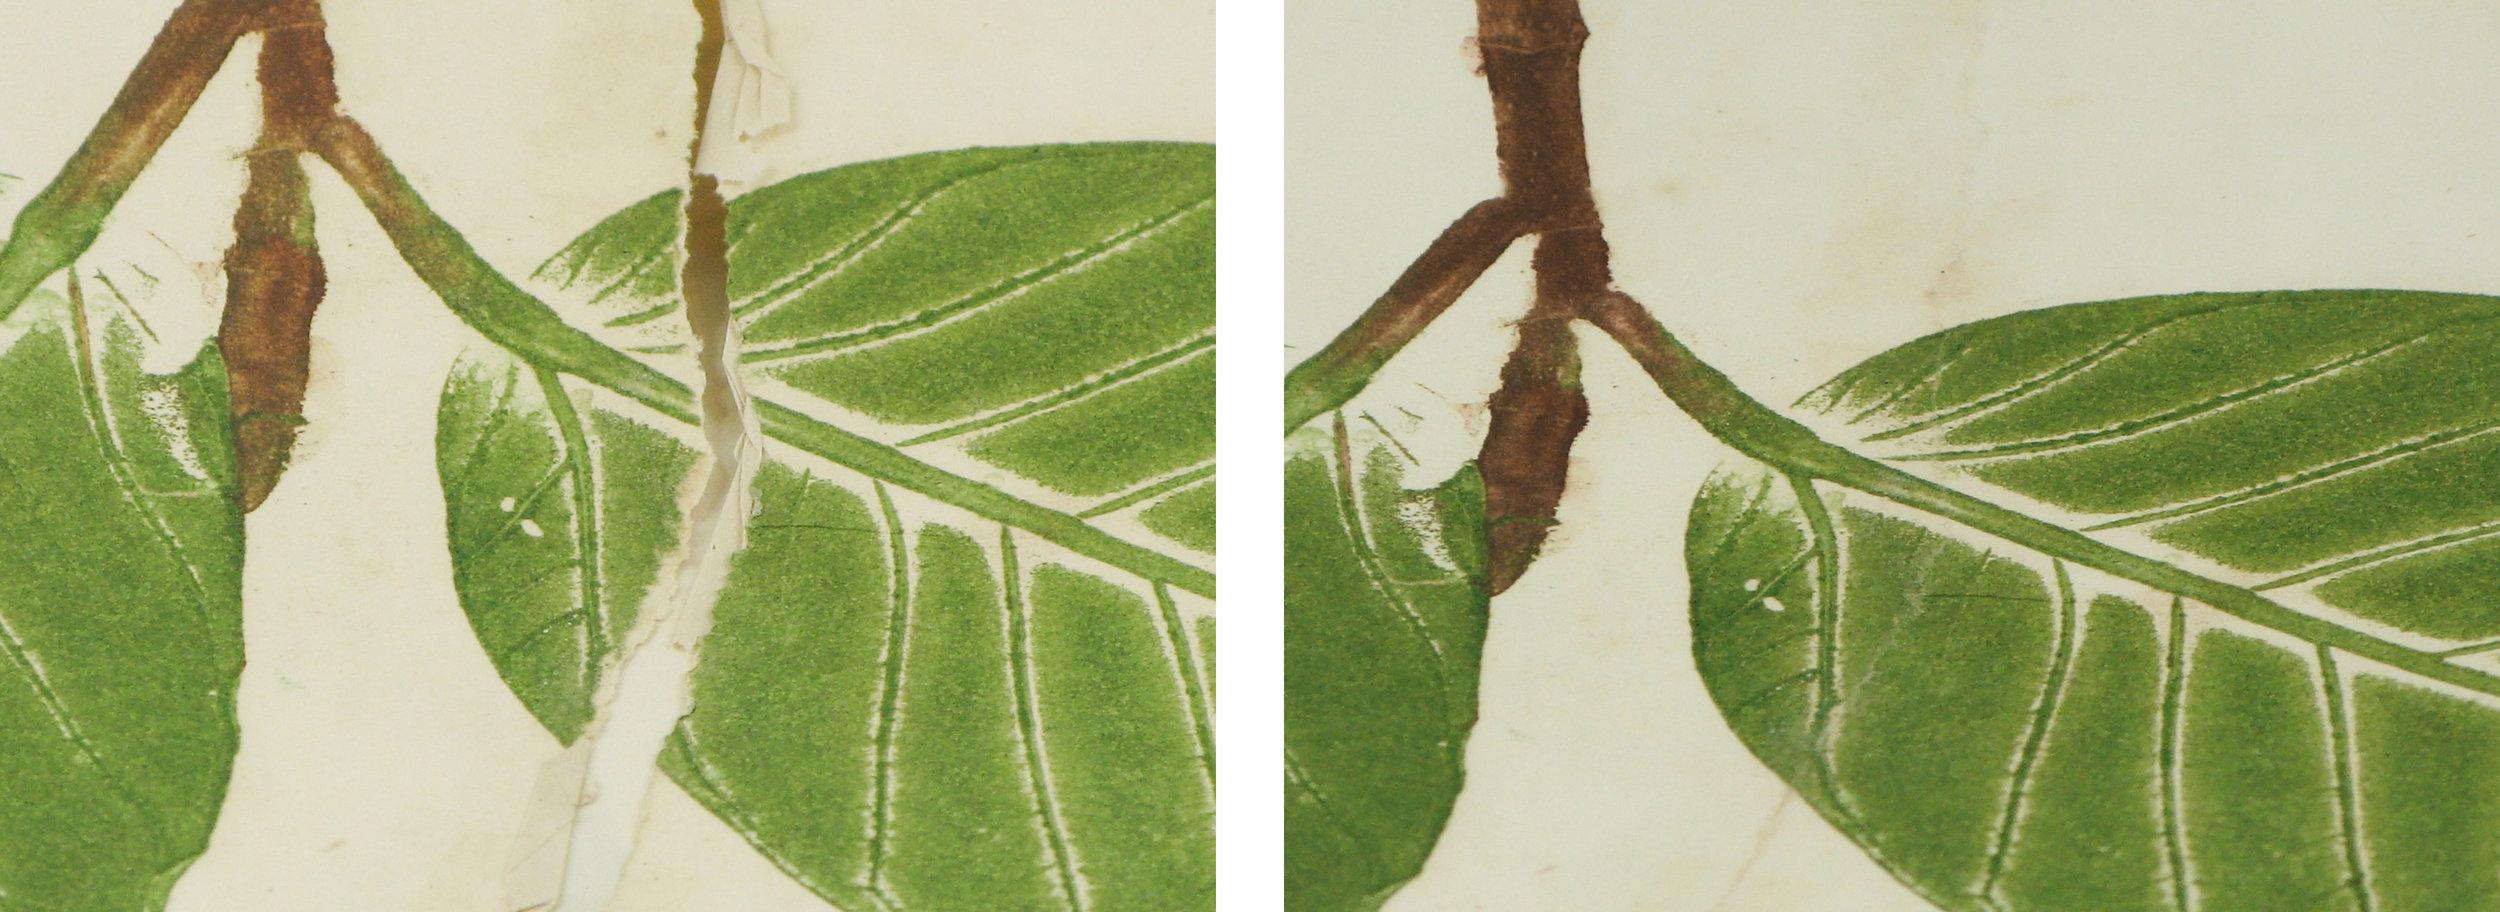 leaf paper repair.11mb.jpg